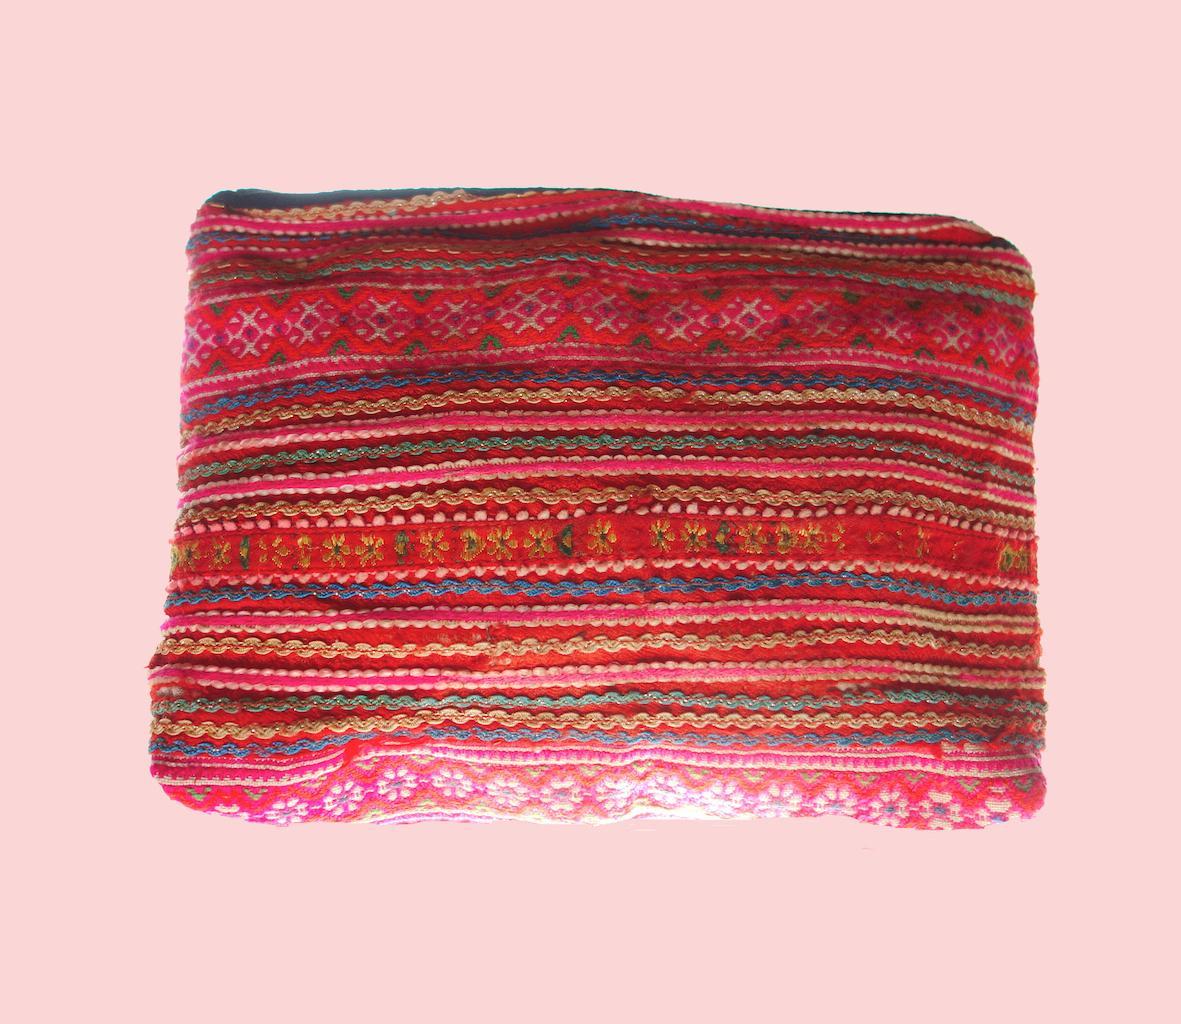 Pochette Tam Dao tissu brodé main vintage minorité Mong